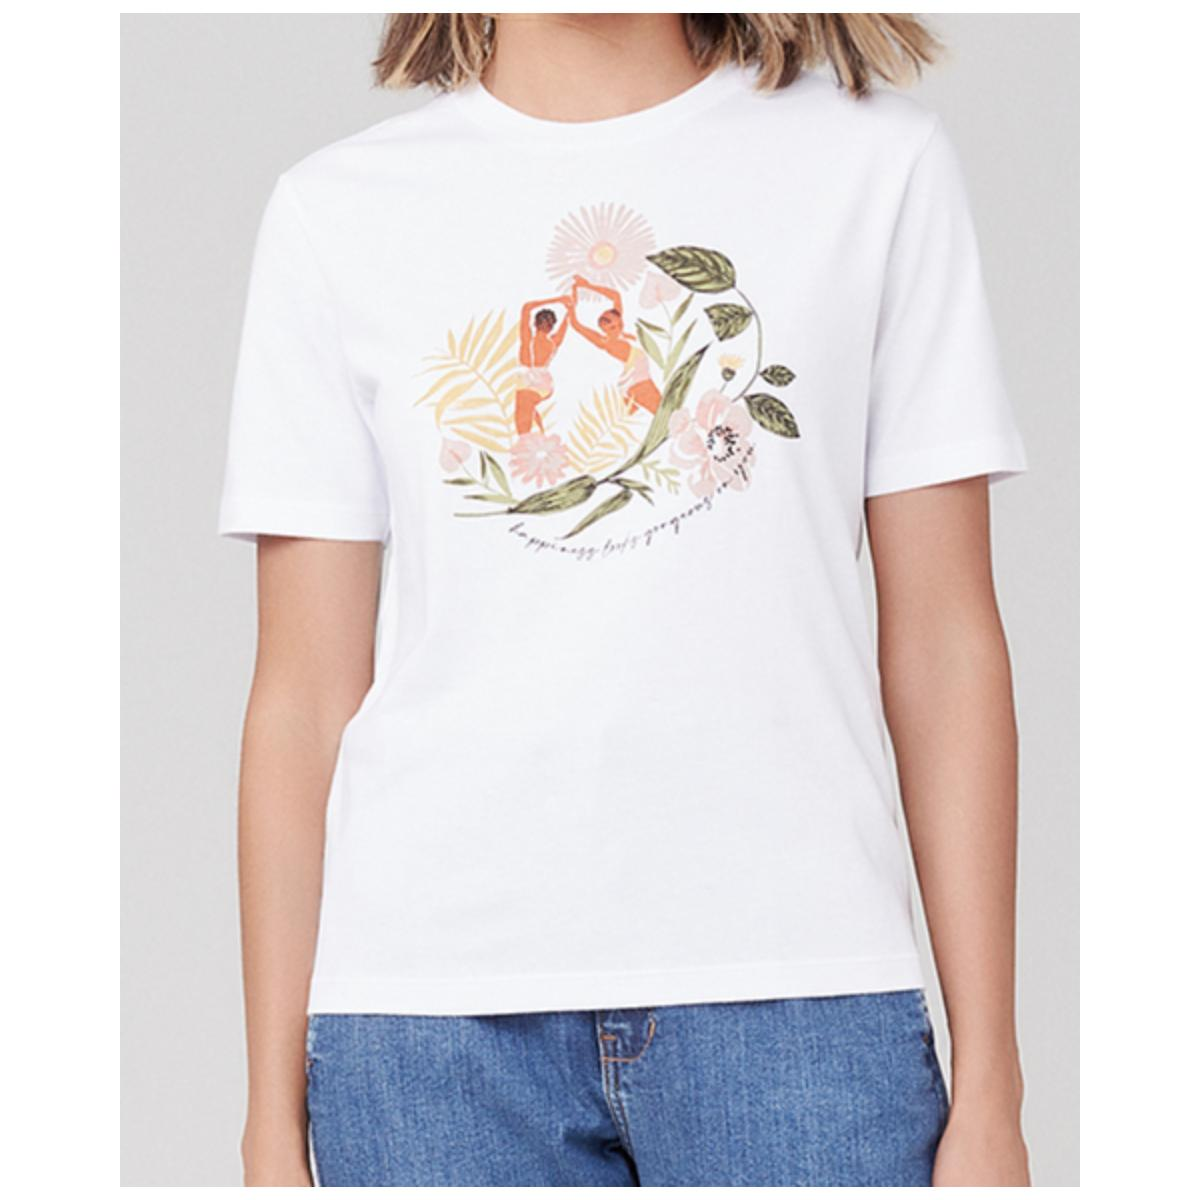 T-shirt Feminino Dzarm 6rz3 N0aen Branco